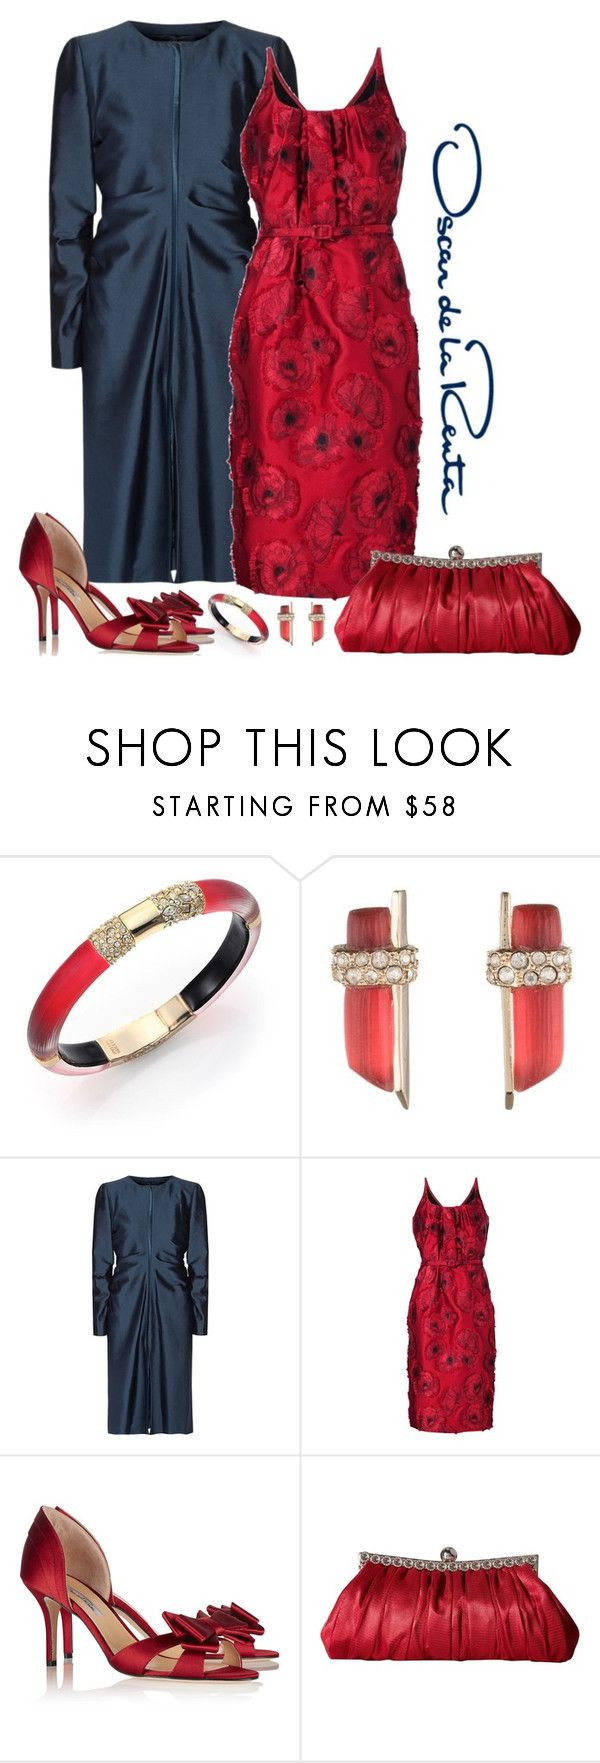 """Oscar de la Renta Floral Jacquard Dress Look"" by romaboots-1 ❤ liked on Polyvore featuring Alexis Bittar, Valentino, Oscar de la Renta and Nina"